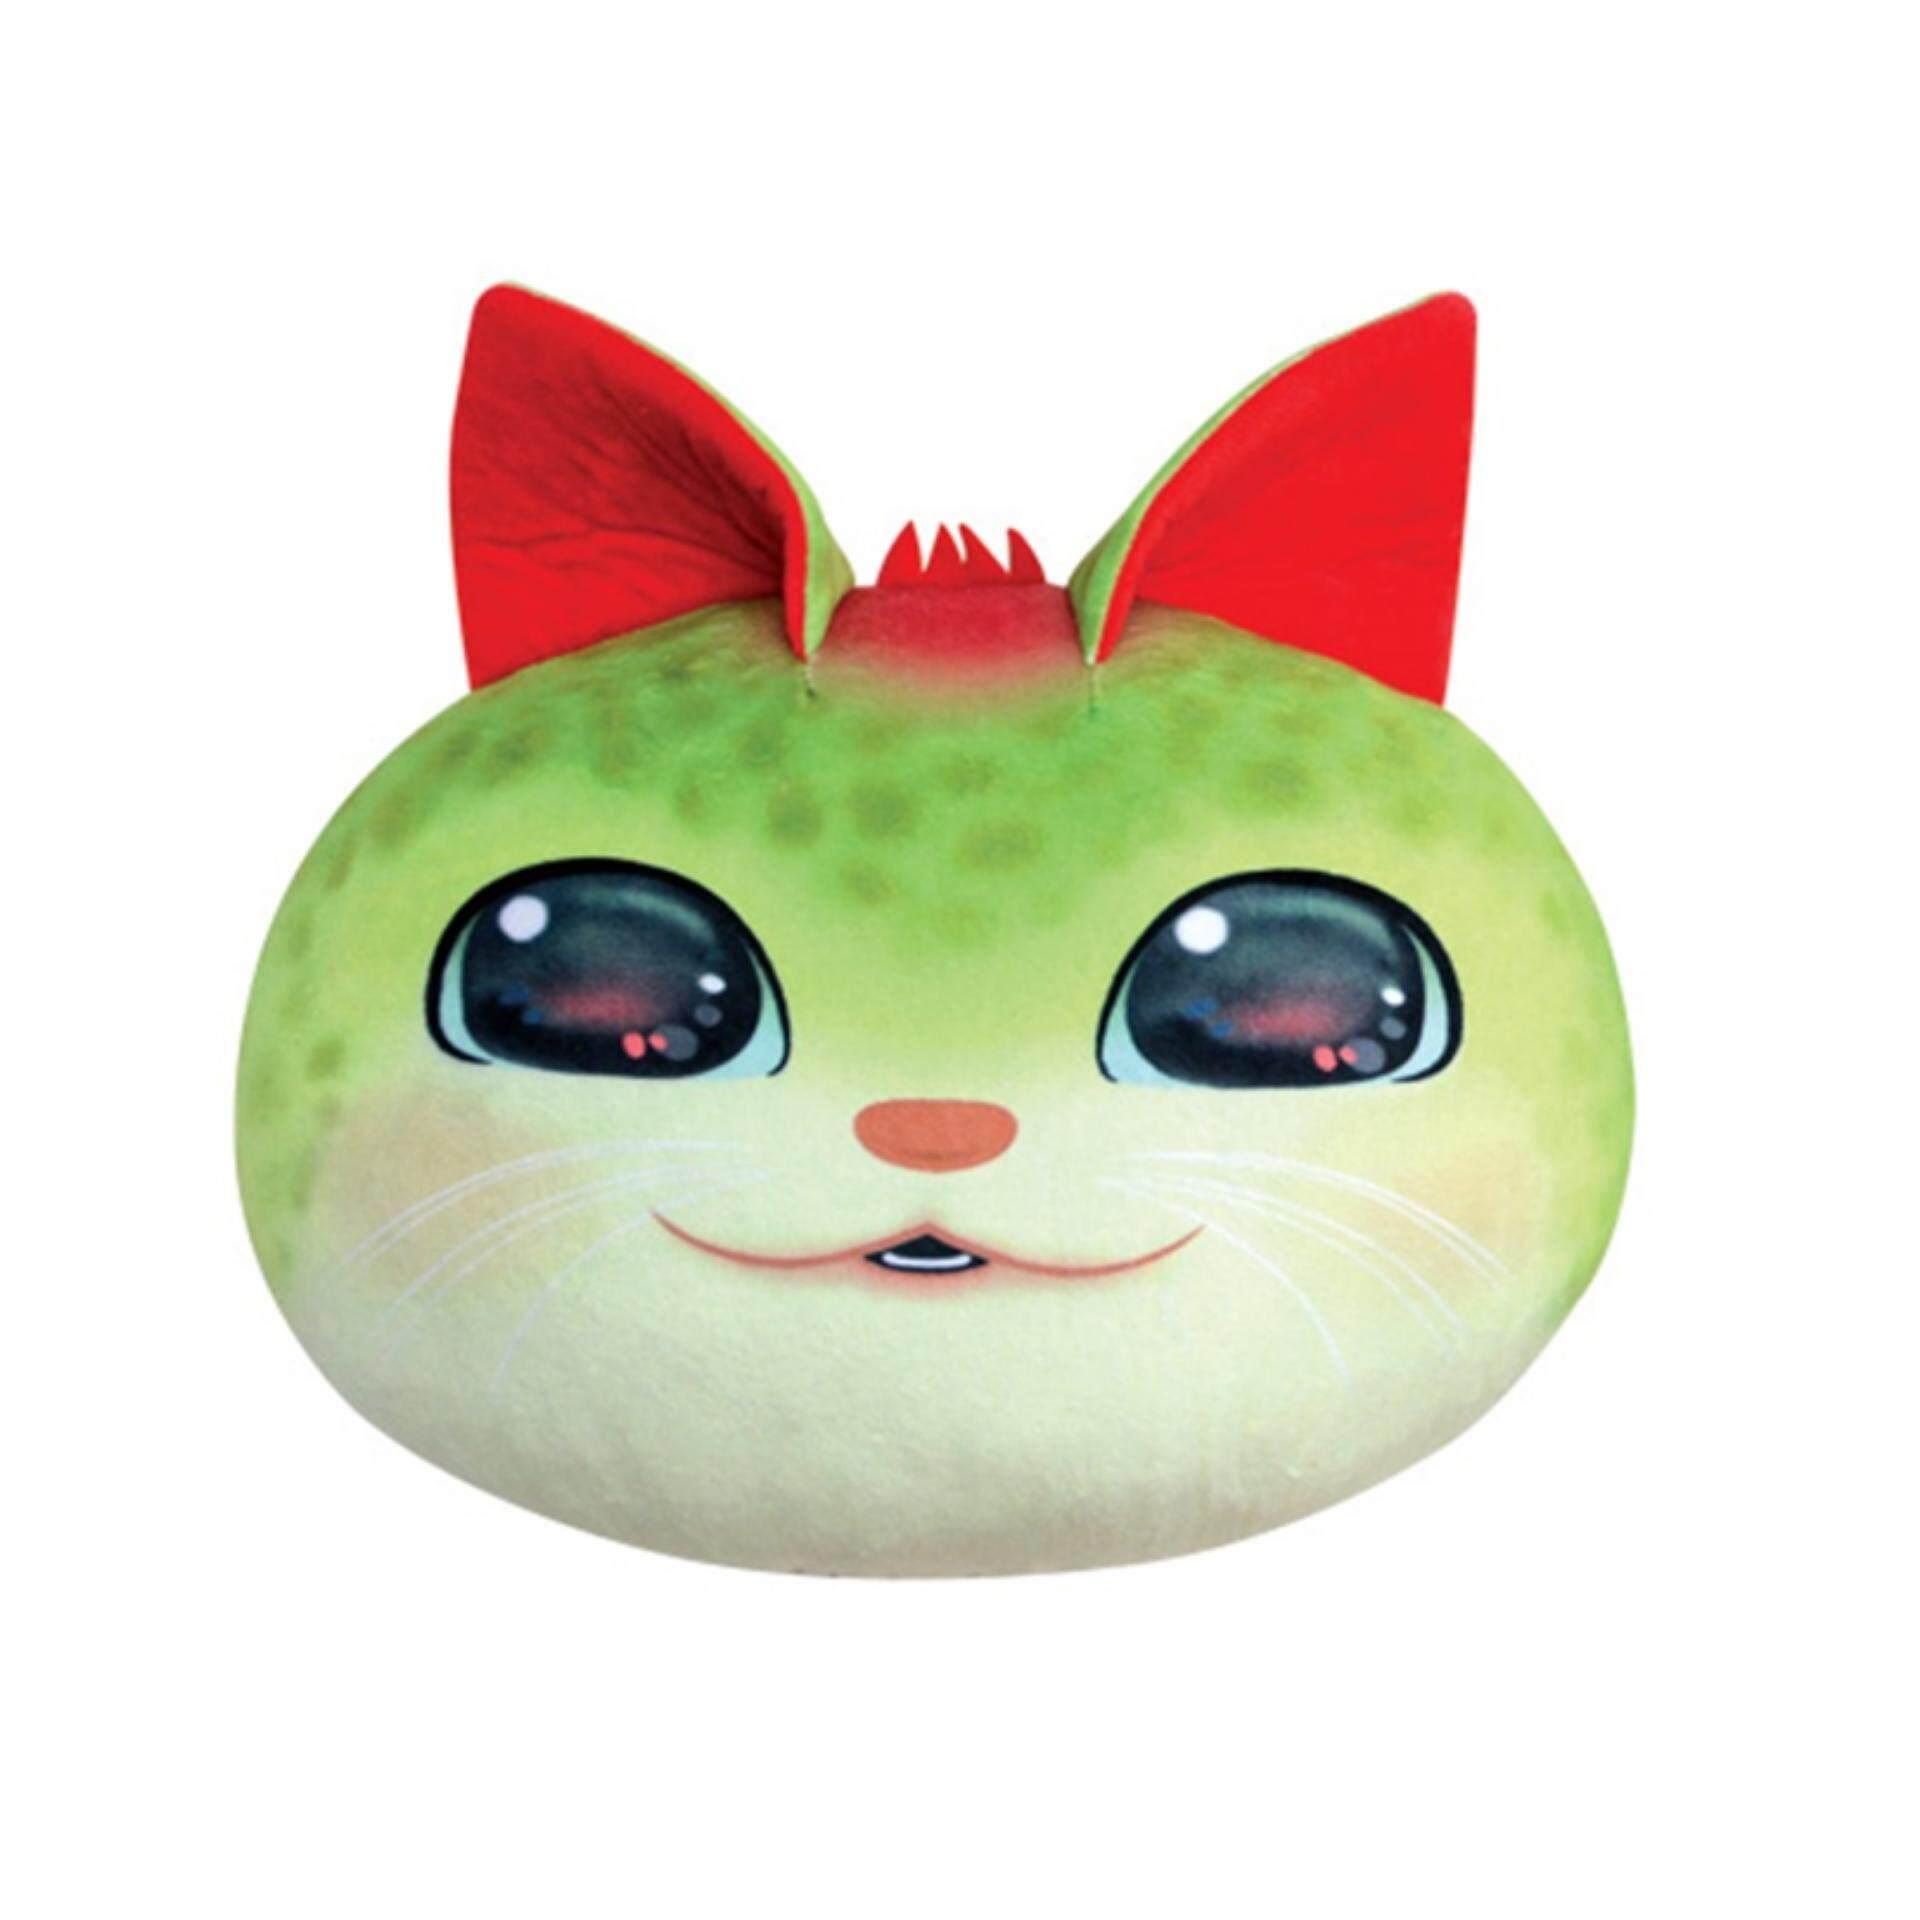 Boboiboy Galaxy Plush Cushion 12 Inches Cattus